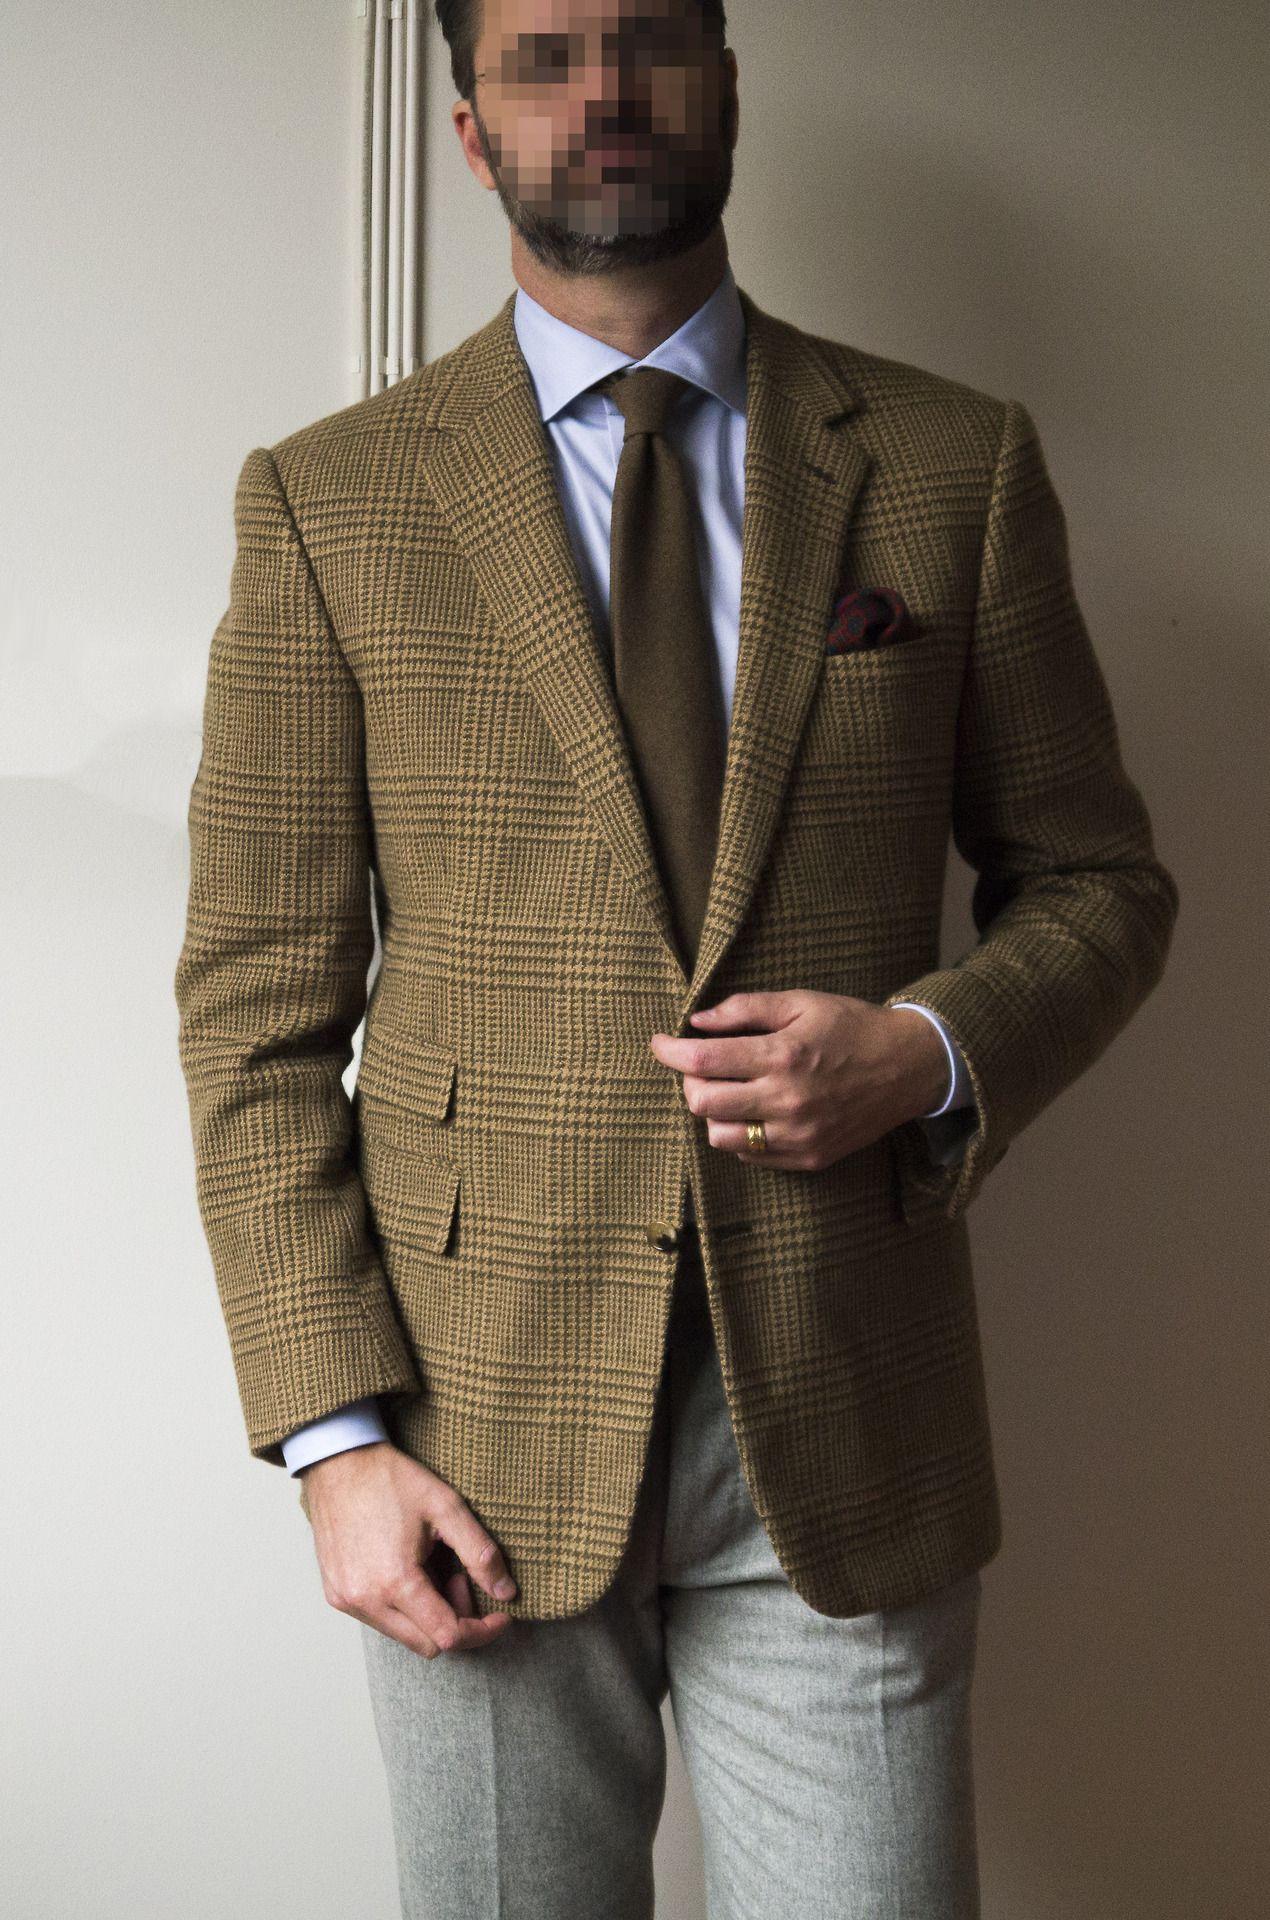 Tan tweed sport coat, light blue shirt, brown tie, light